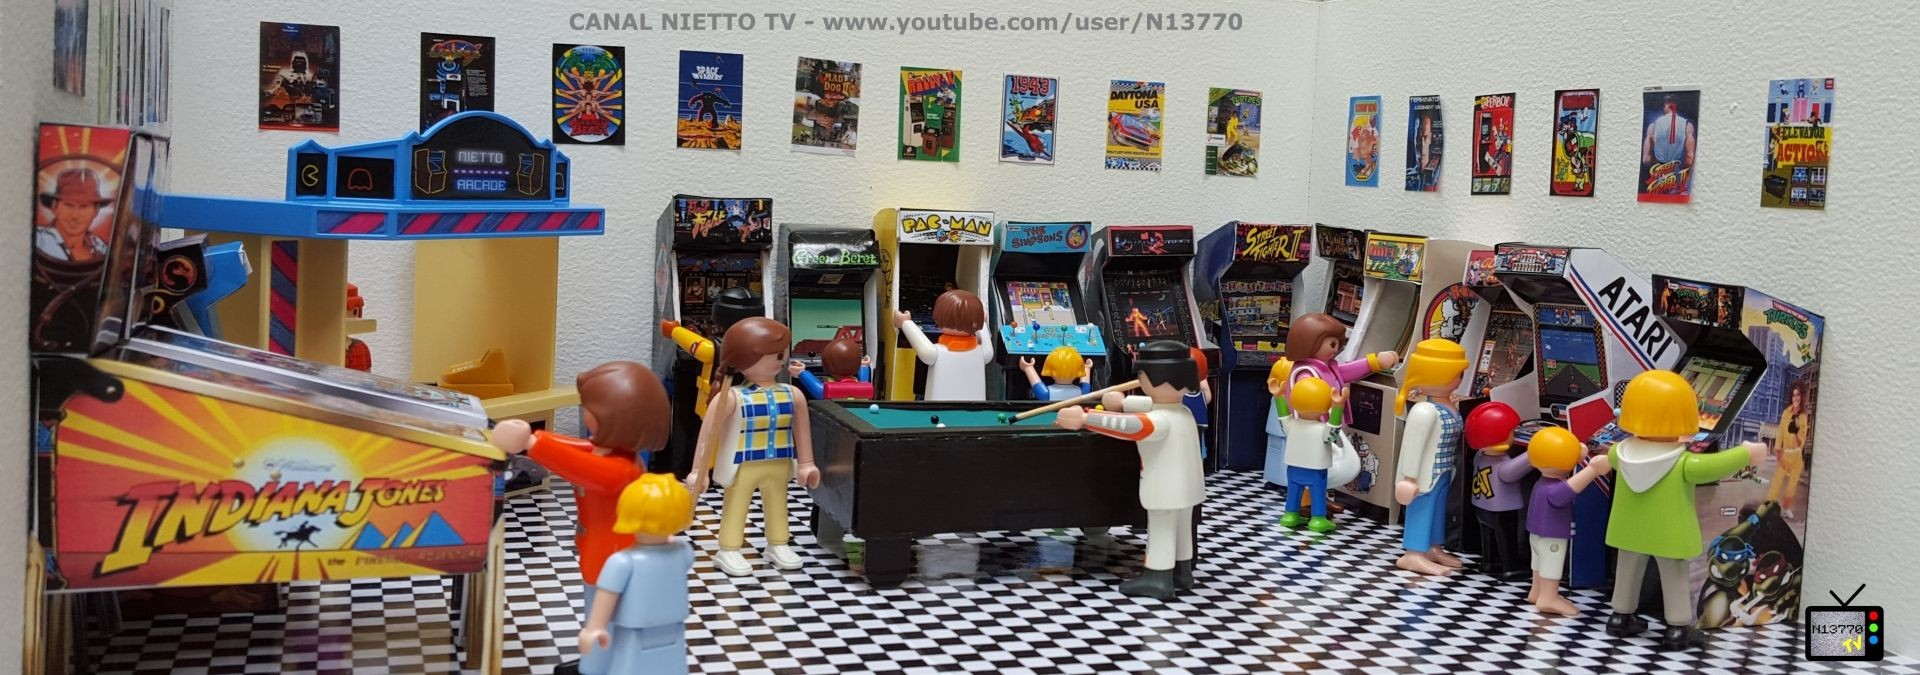 Arcade Papercraft Arcade Nietto 03 N Tv